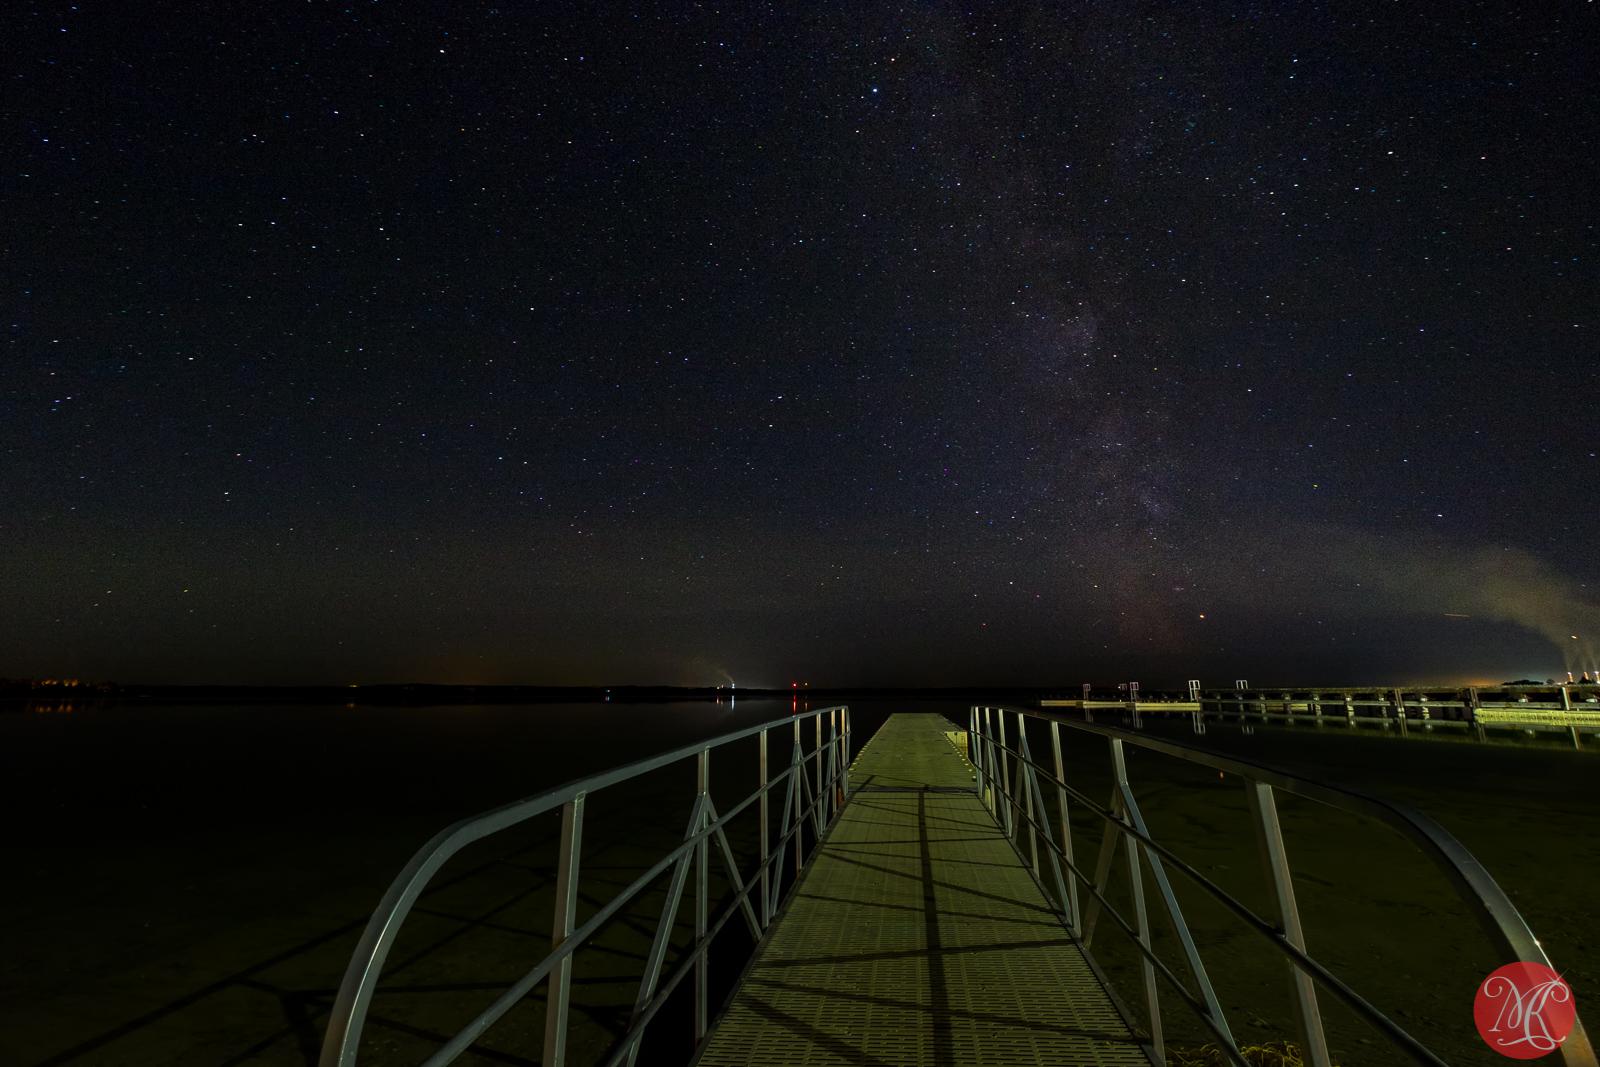 a night full of stars